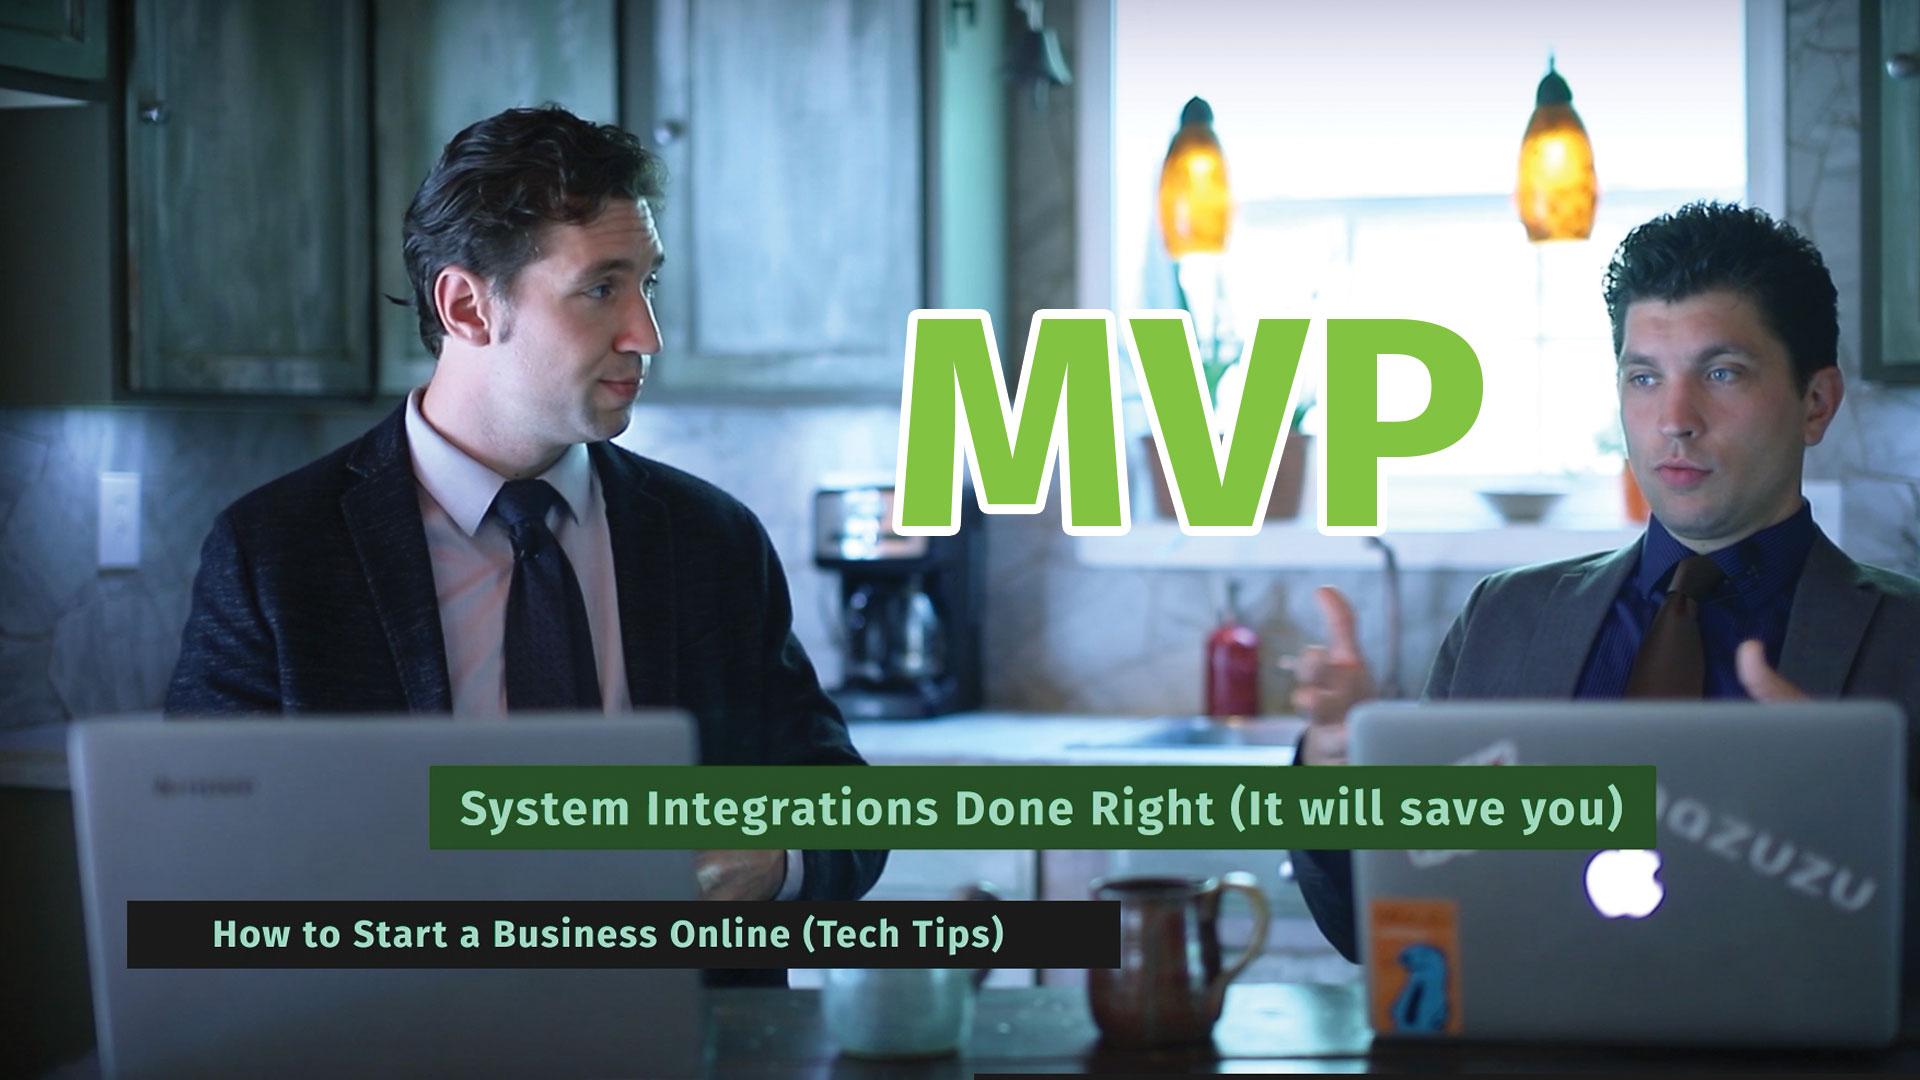 Watch Minimum Viable Product (MVP) and web development on Youtube